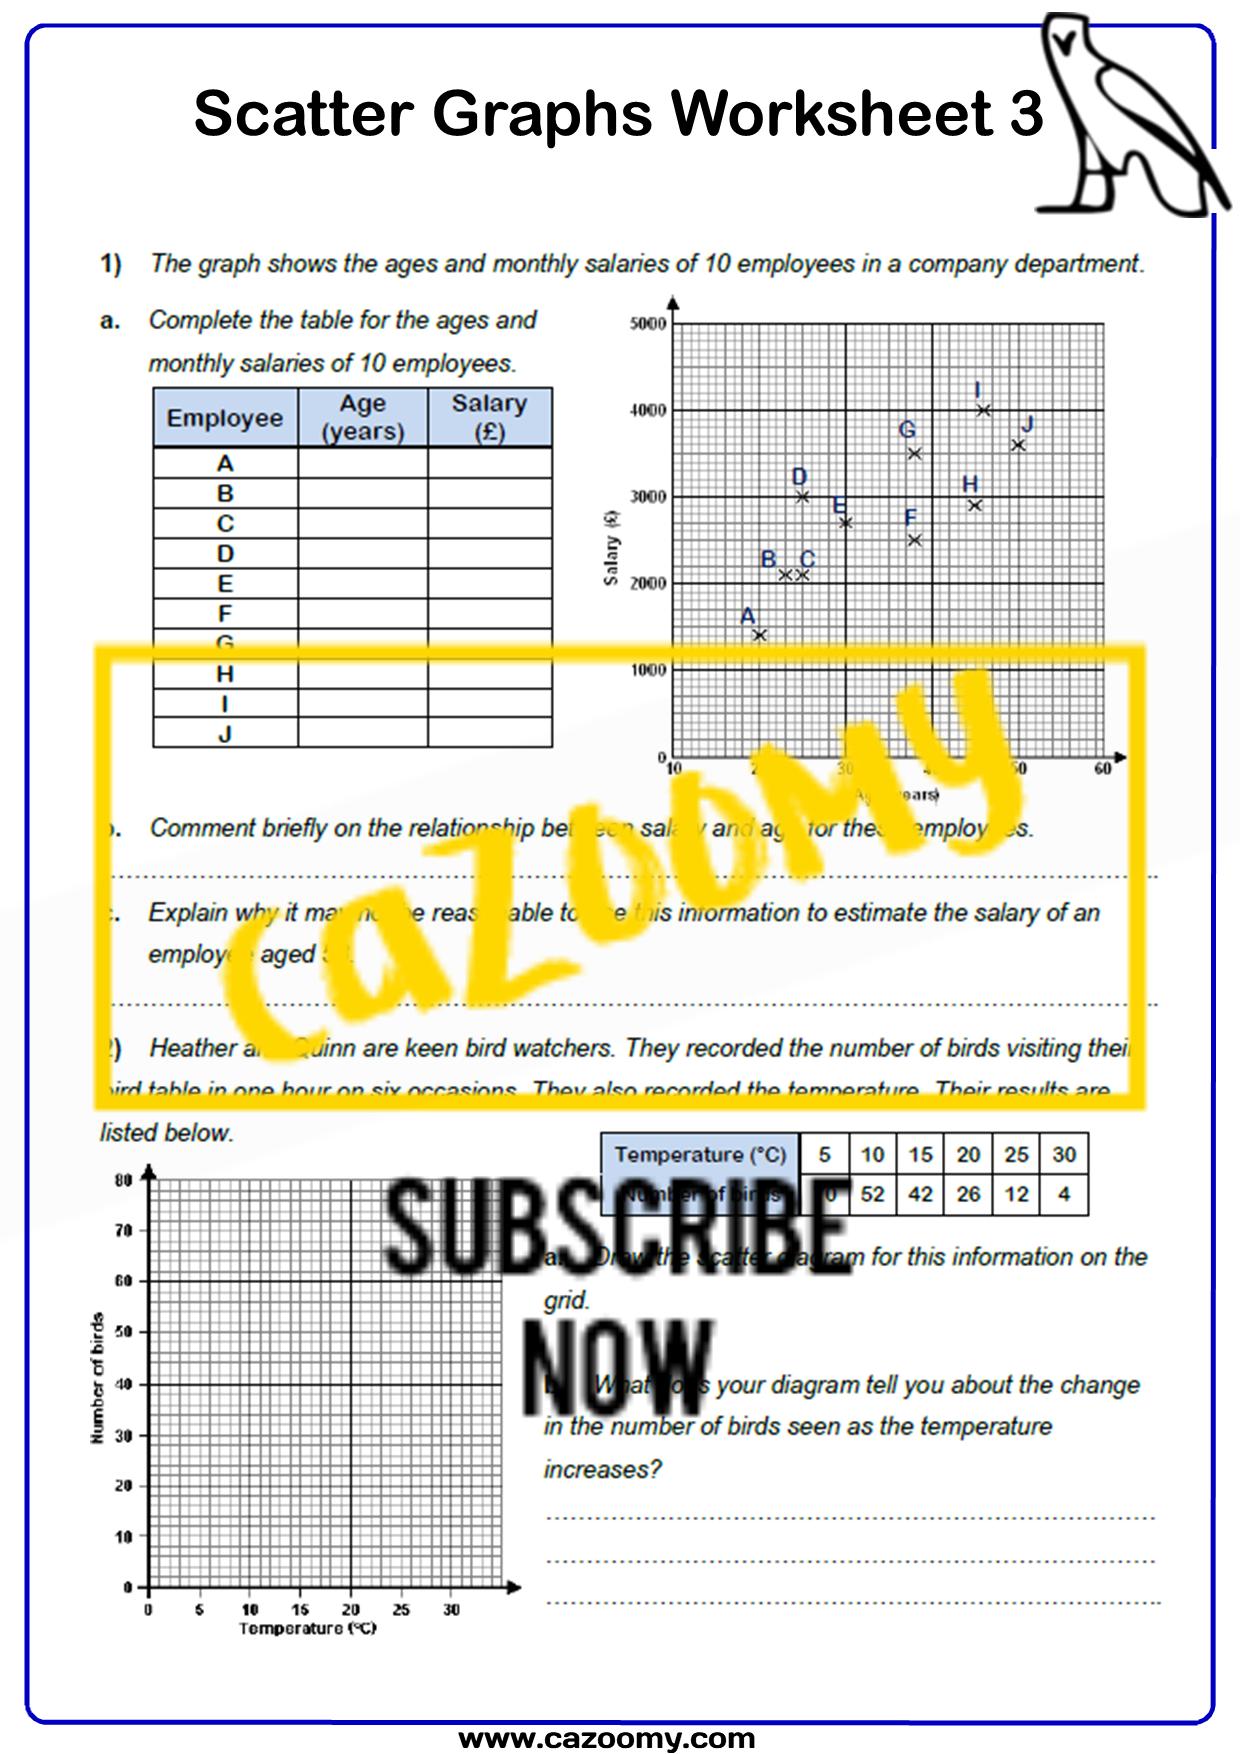 Scatter Graphs Worksheet 3